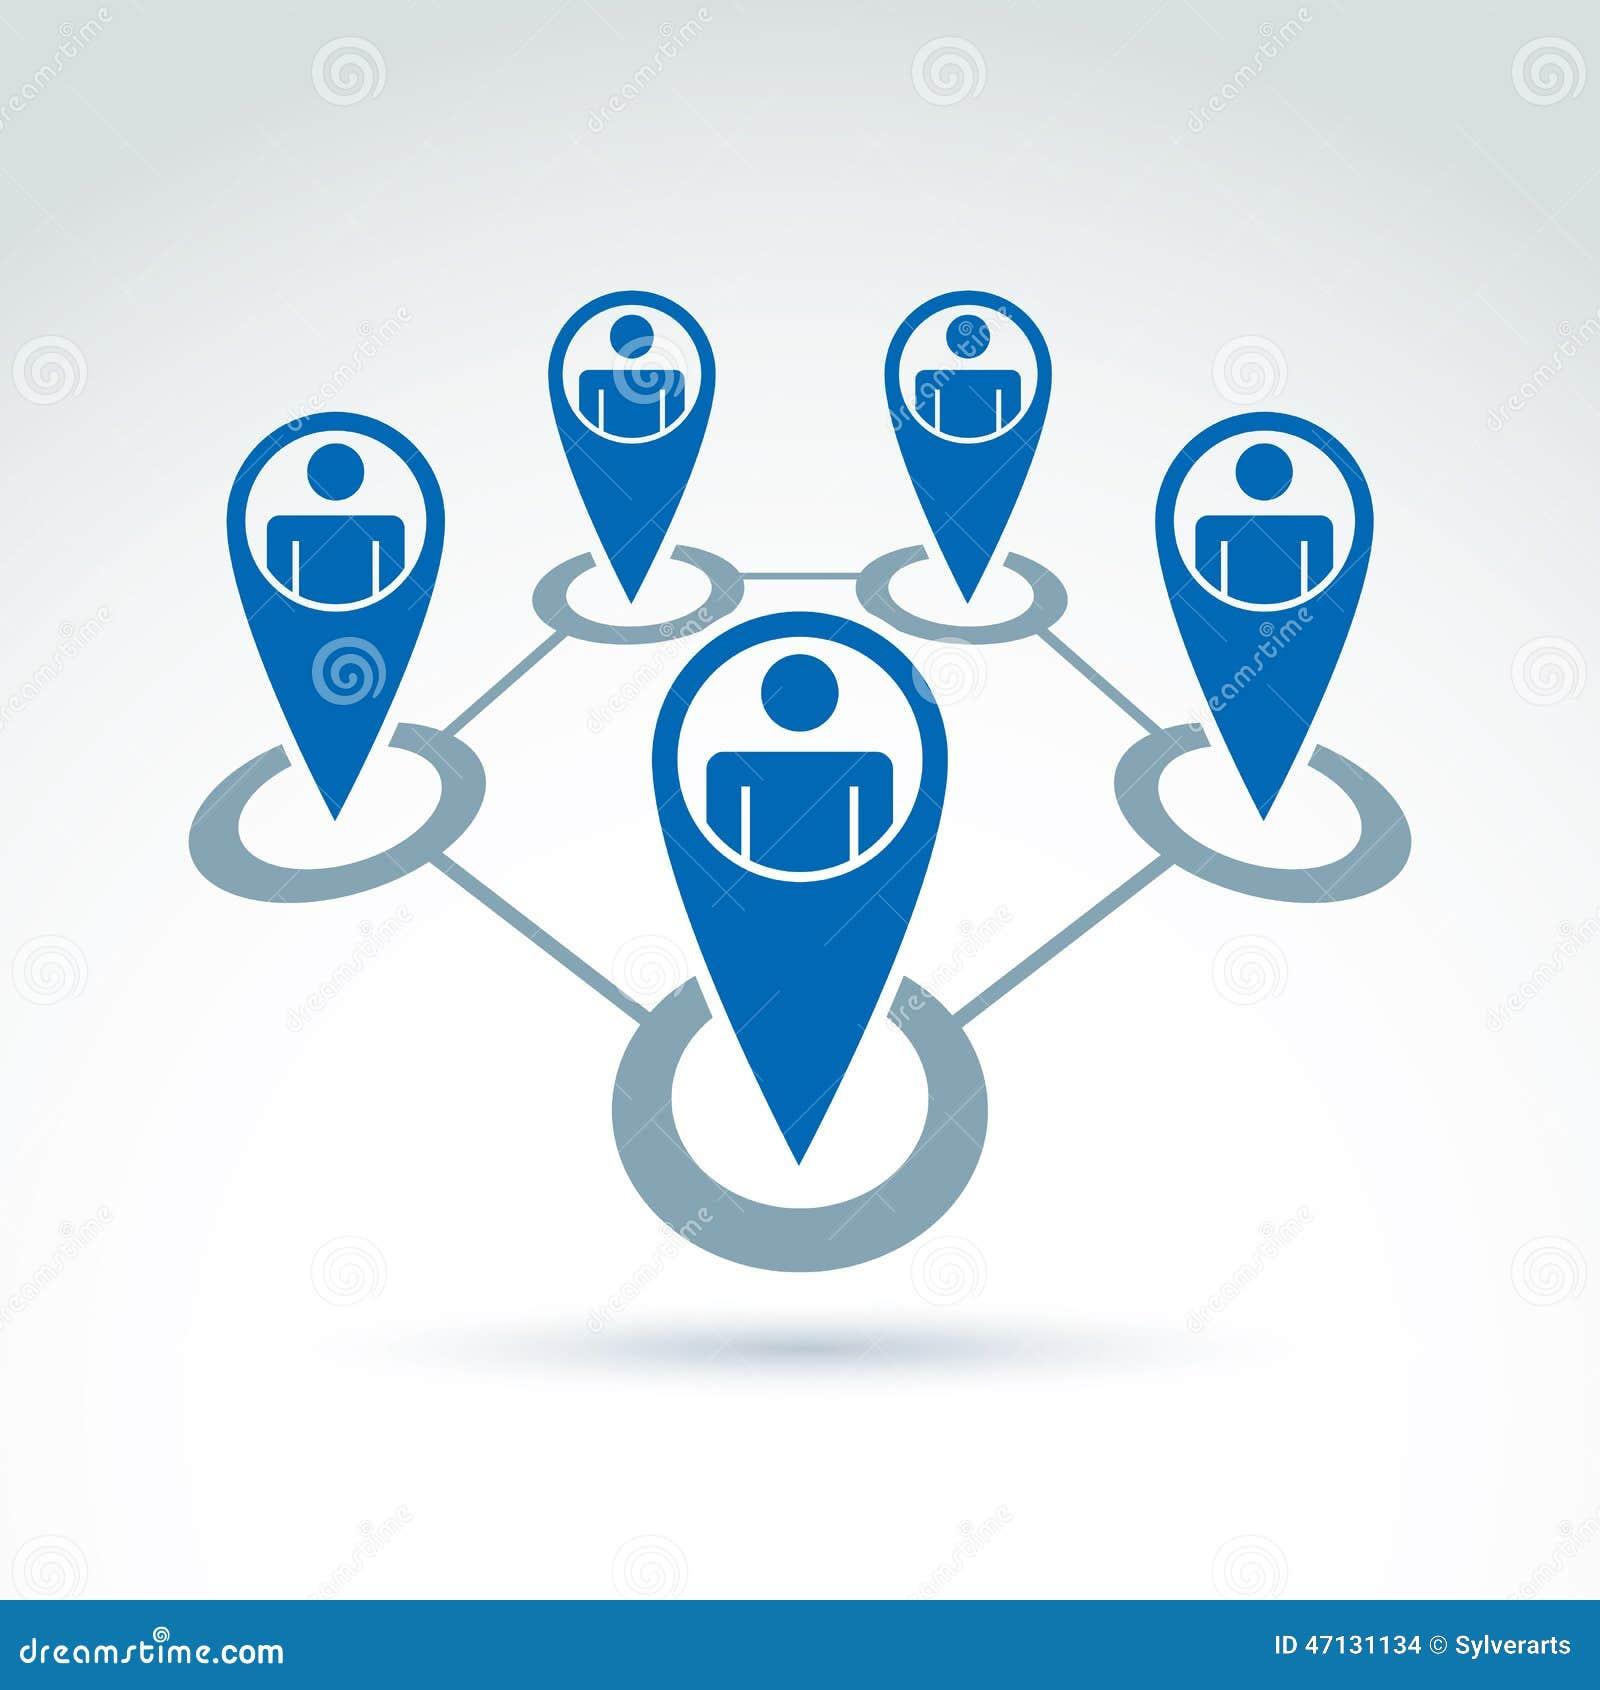 Teamwork in a Business Organization Essay Sample